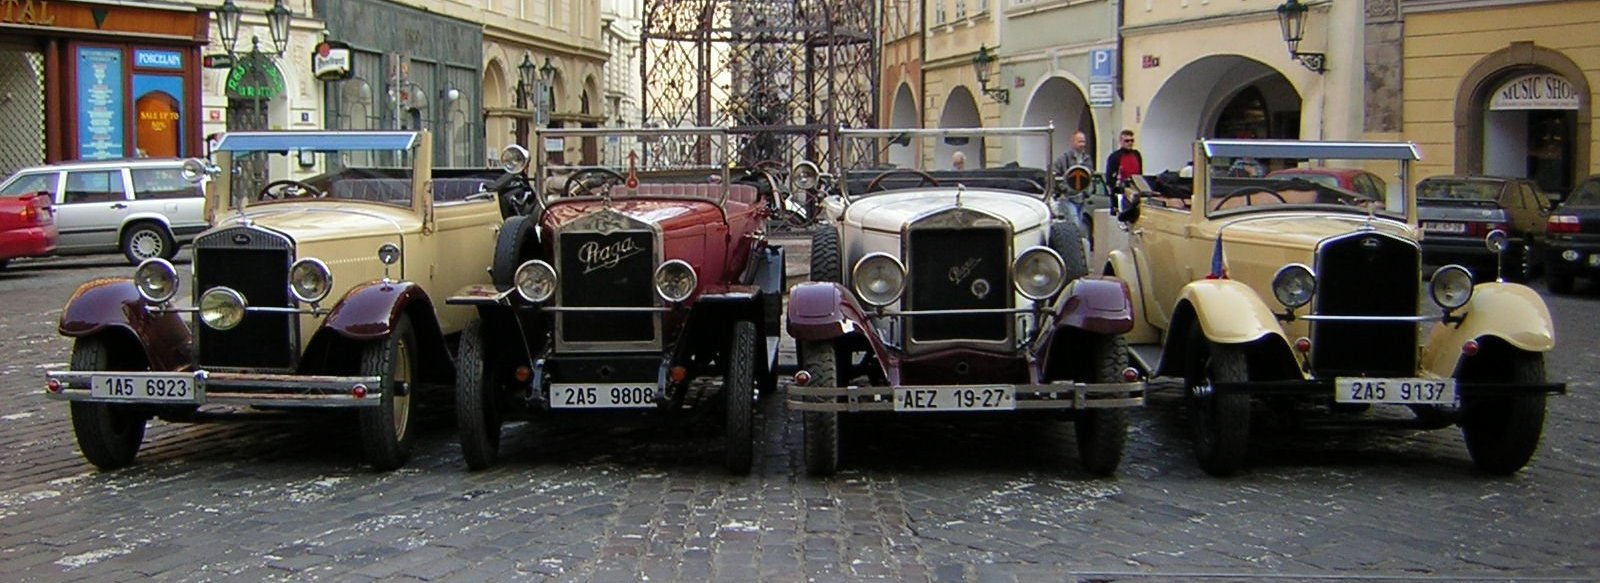 Group transportation in Prague, Transportation